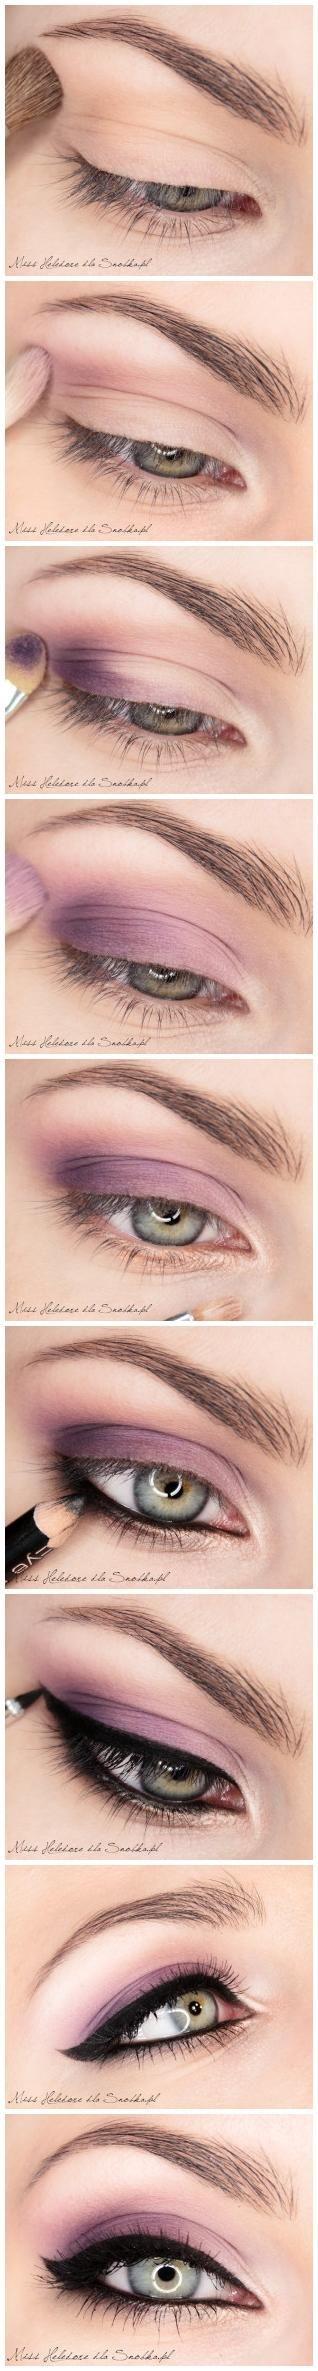 eyeliner + purple eye shadow